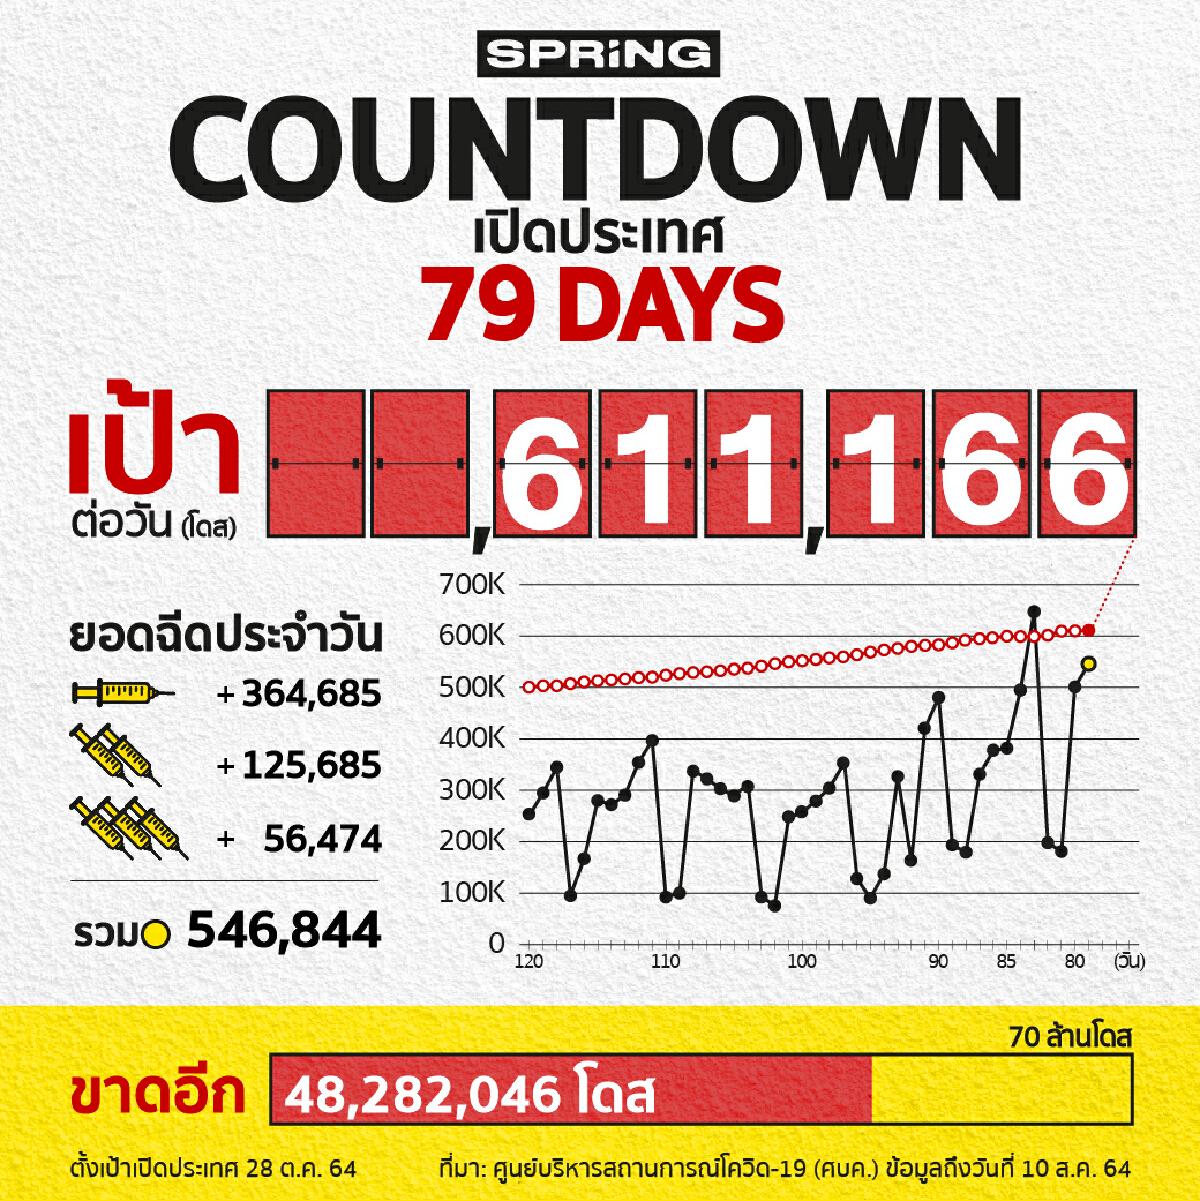 COUNTDOWN! เปิดประเทศใน 79 วัน ฉีดวัคซีนโควิด 546,844 โดส